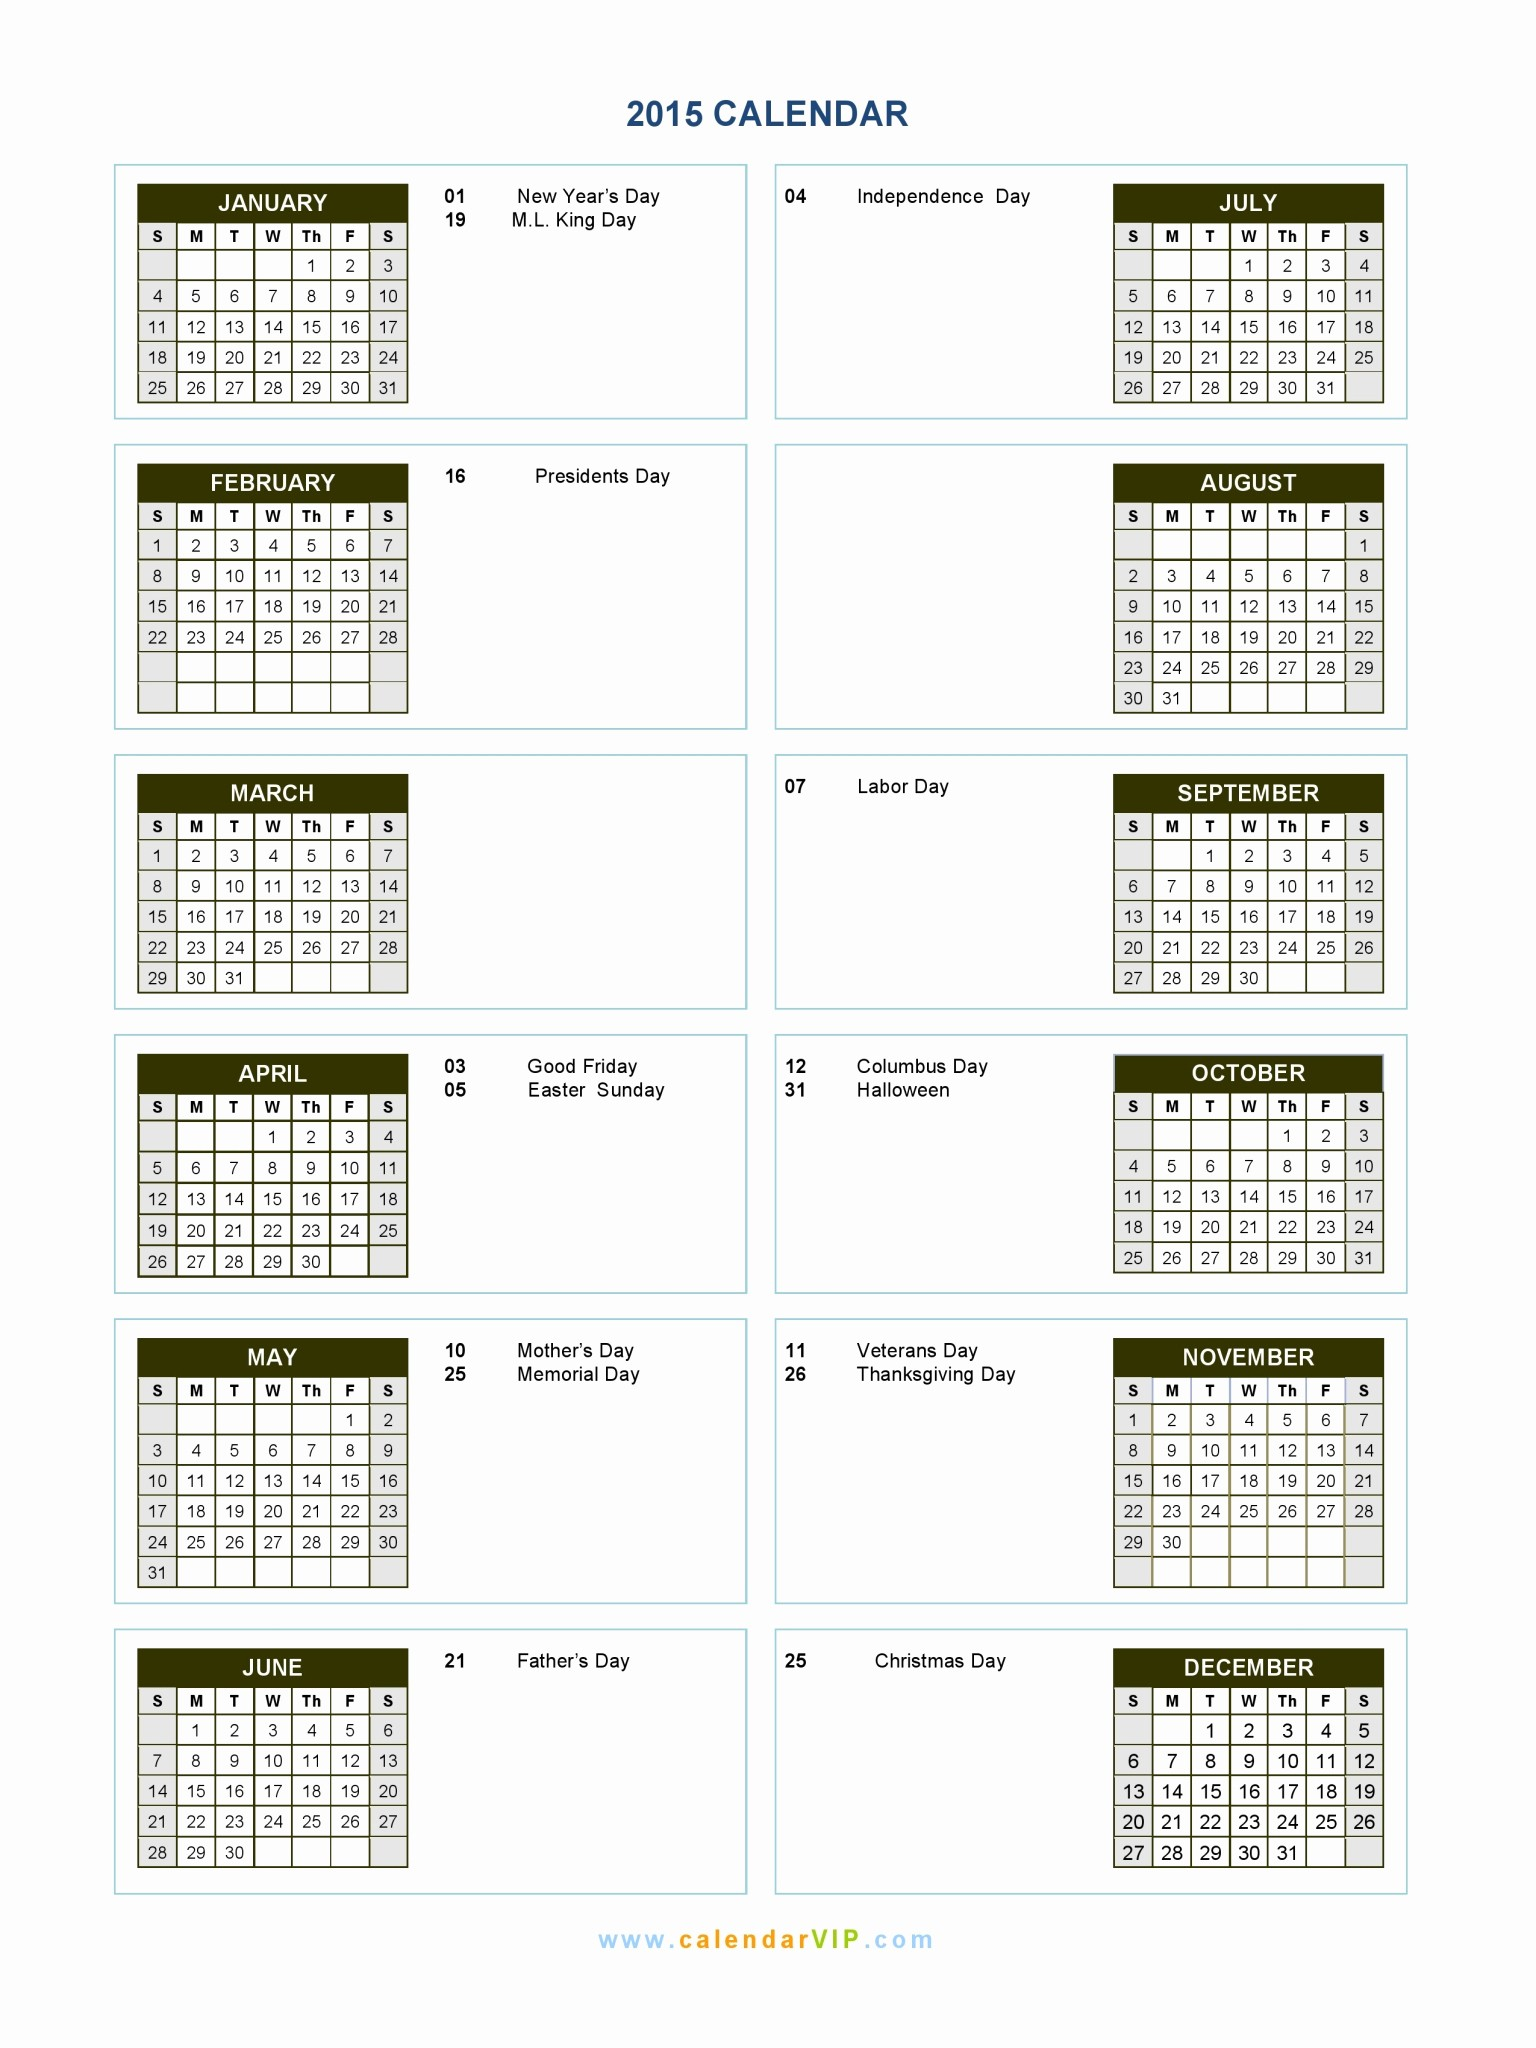 Calendar Of events Template 2015 Luxury 2015 Calendar Blank Printable Calendar Template In Pdf